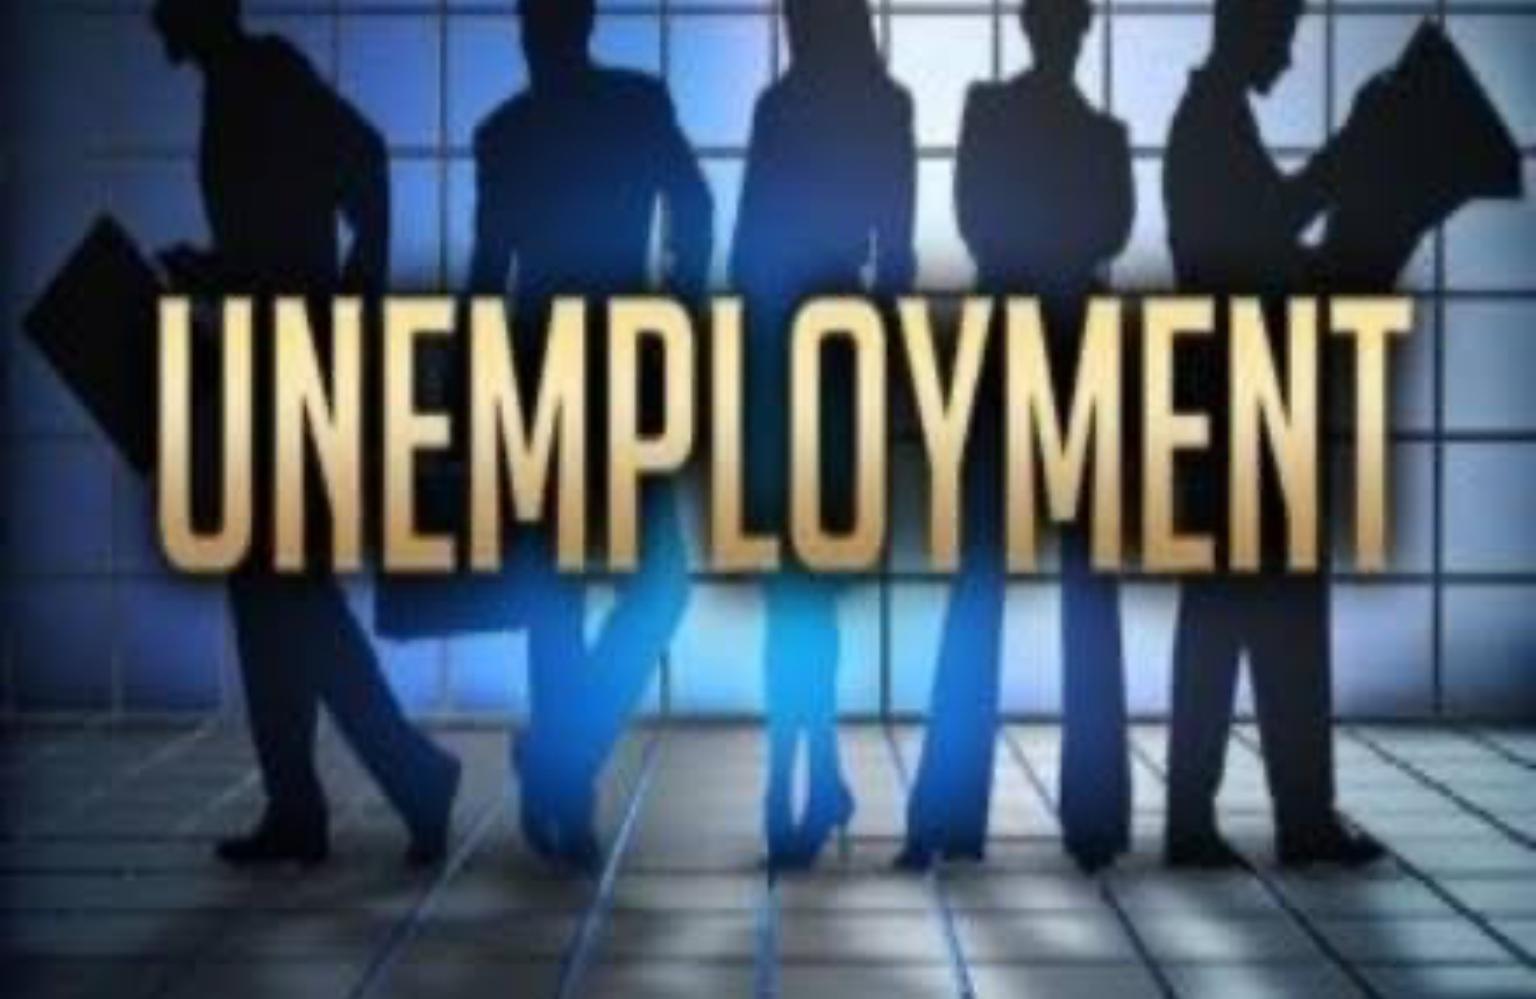 Unemployment: Nigeria Hits A Record Of 33.3 Percent